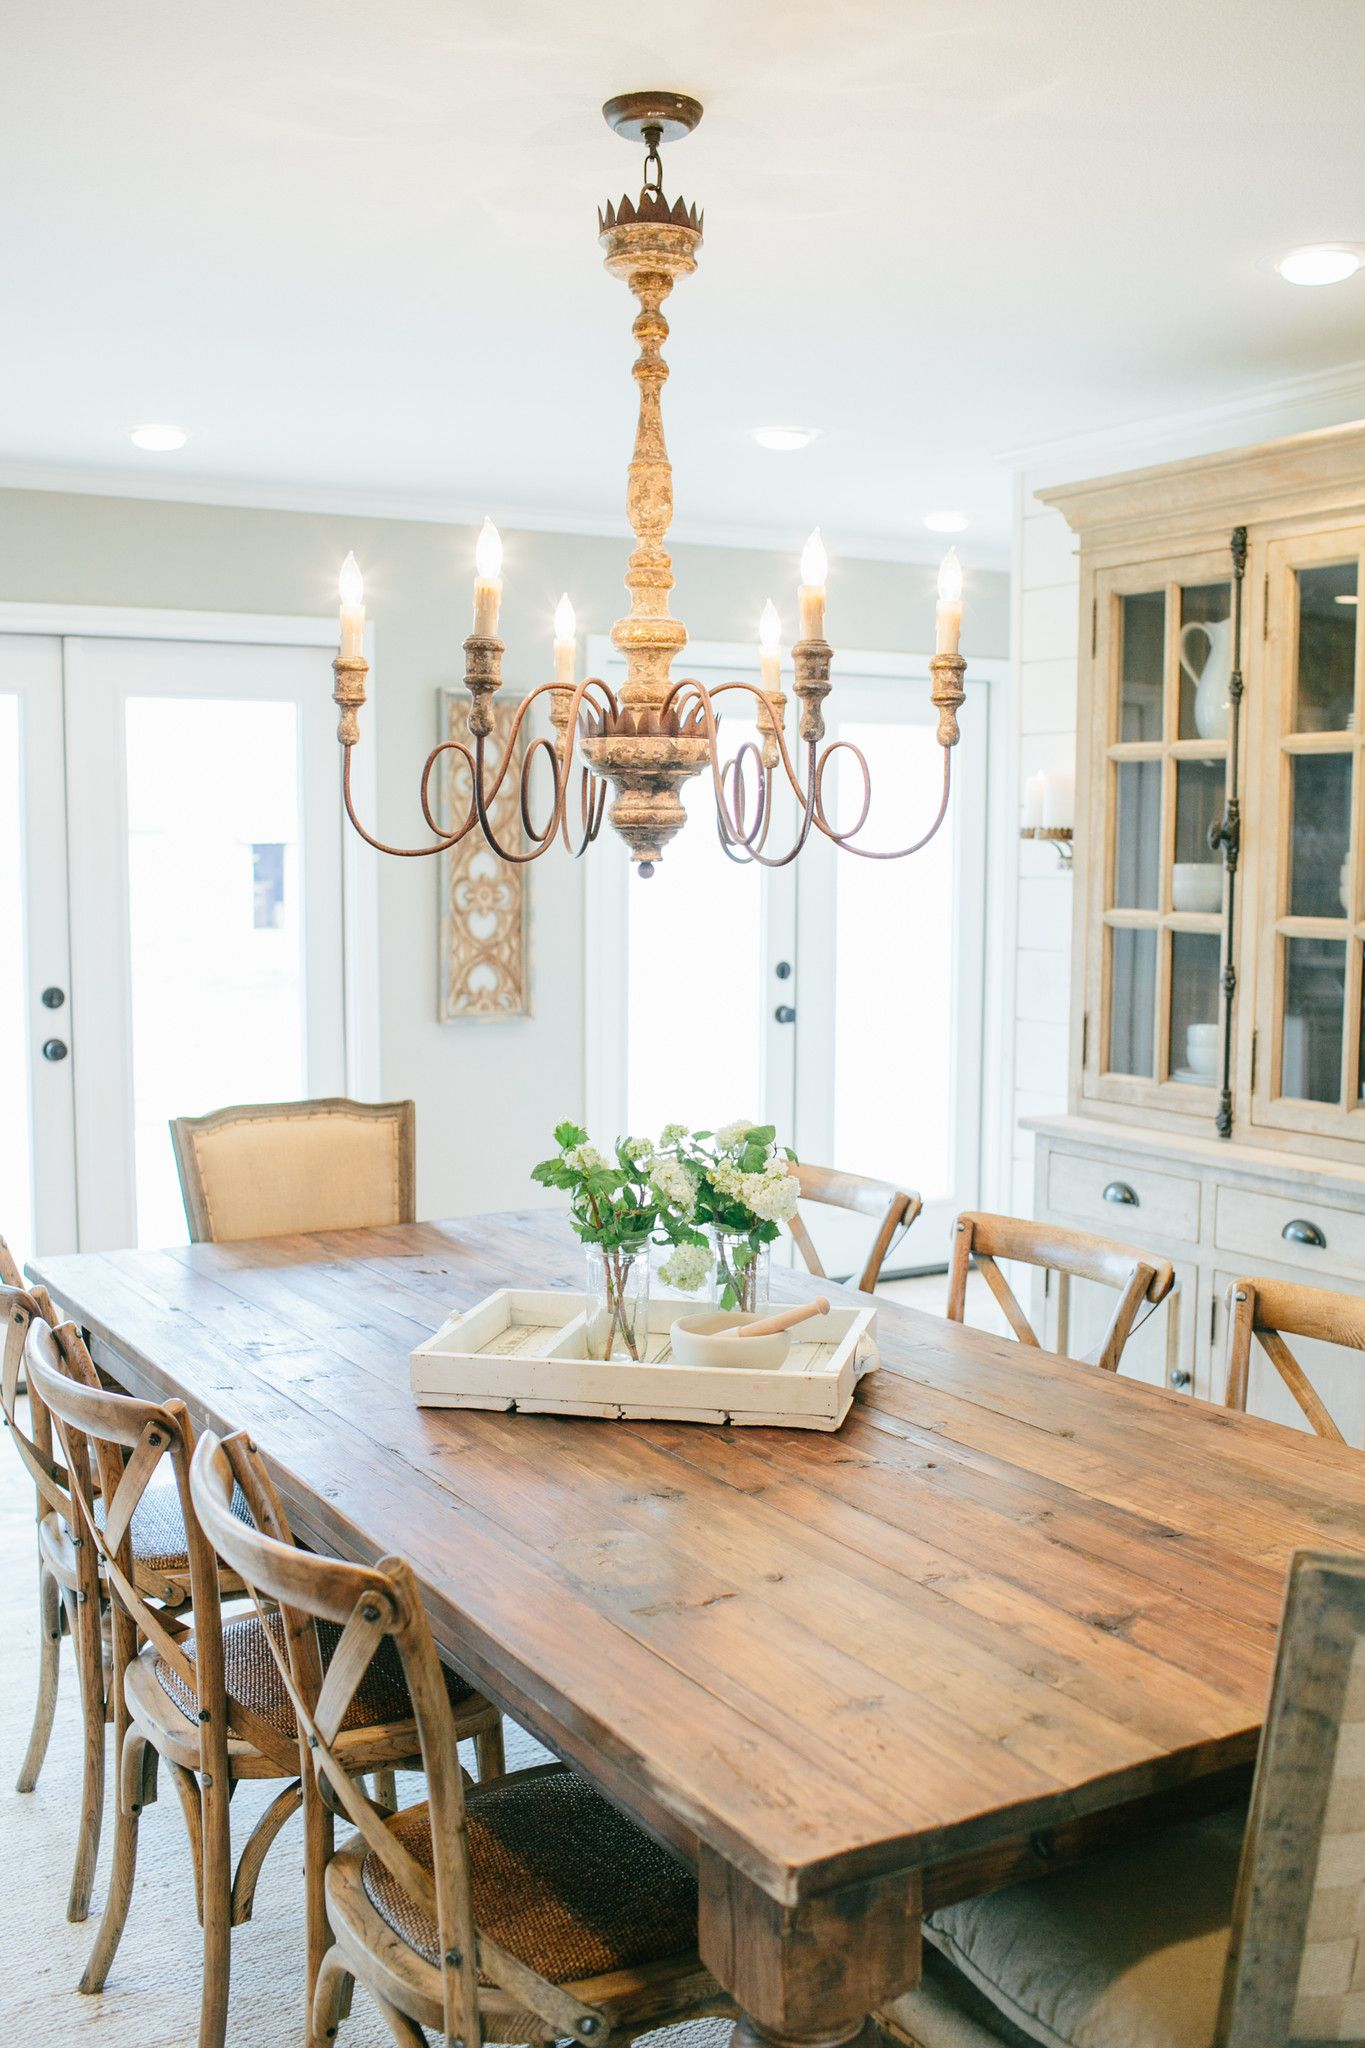 Ellis Chandelier | The Magnolia Market | Dining Room | Pinterest ...